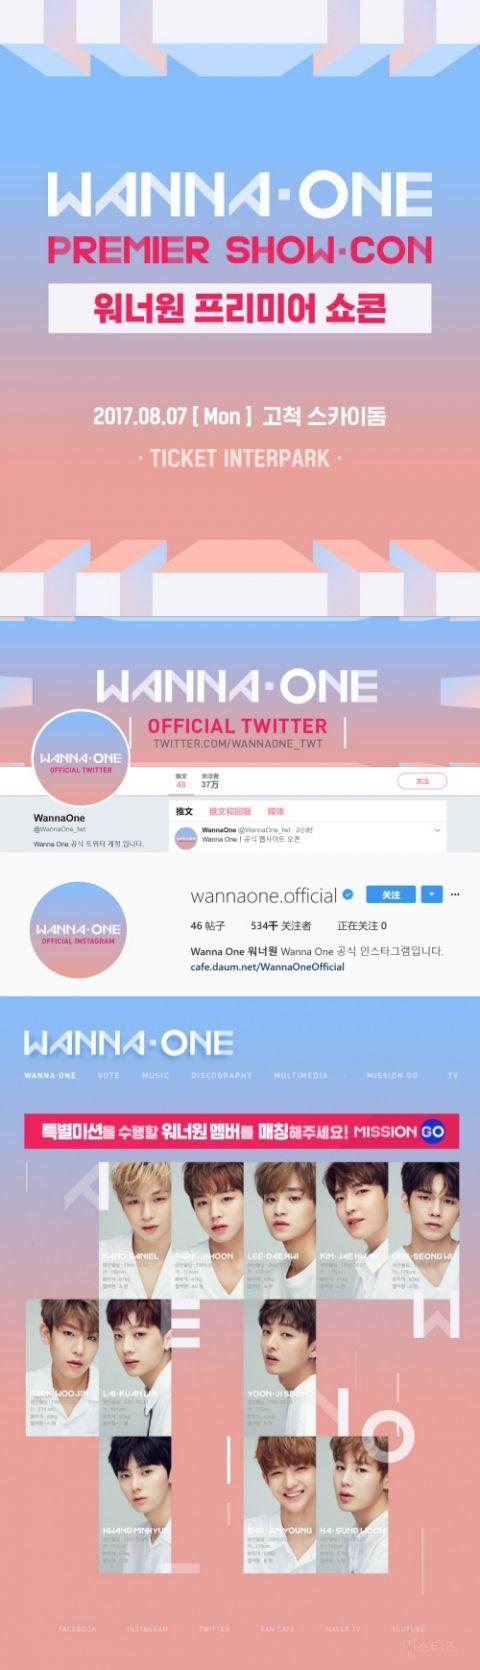 Wanna One與SEVENTEEN應援色爭議後 Pledis的反應讓粉絲大讚 - KSD 韓星網 (KPOP)